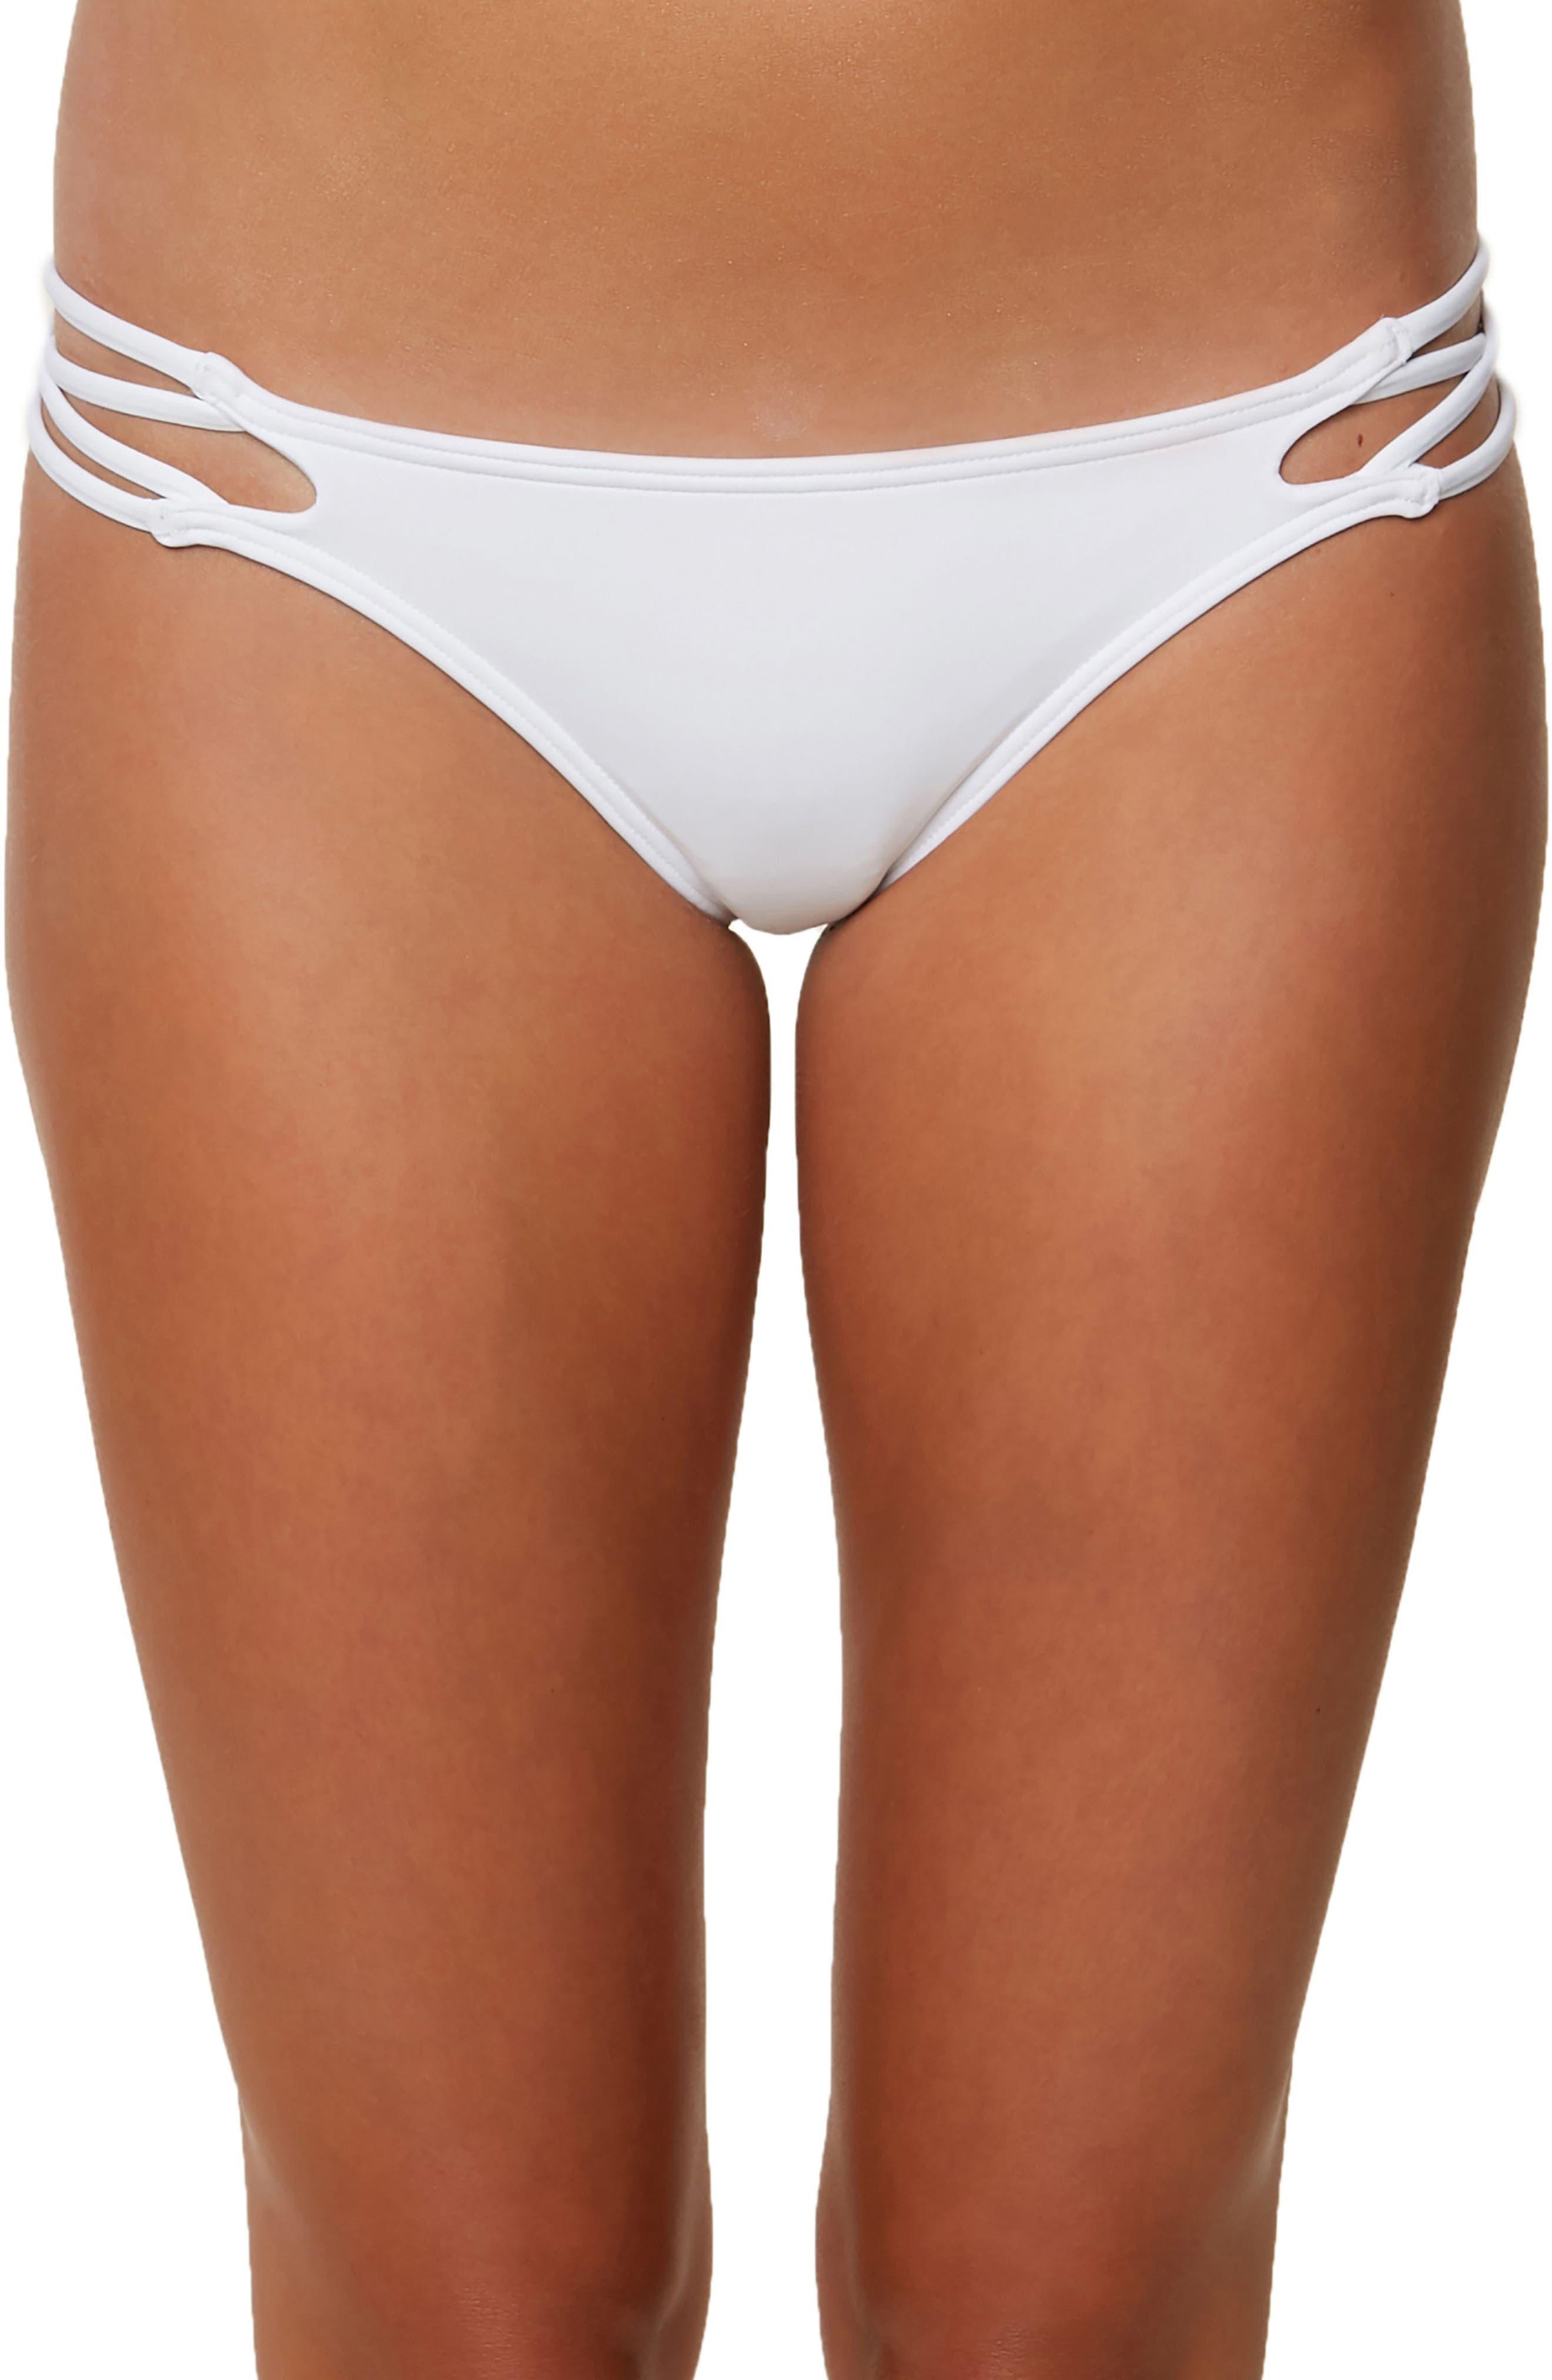 Salt Water Crisscross Bikini Bottoms,                             Main thumbnail 1, color,                             100